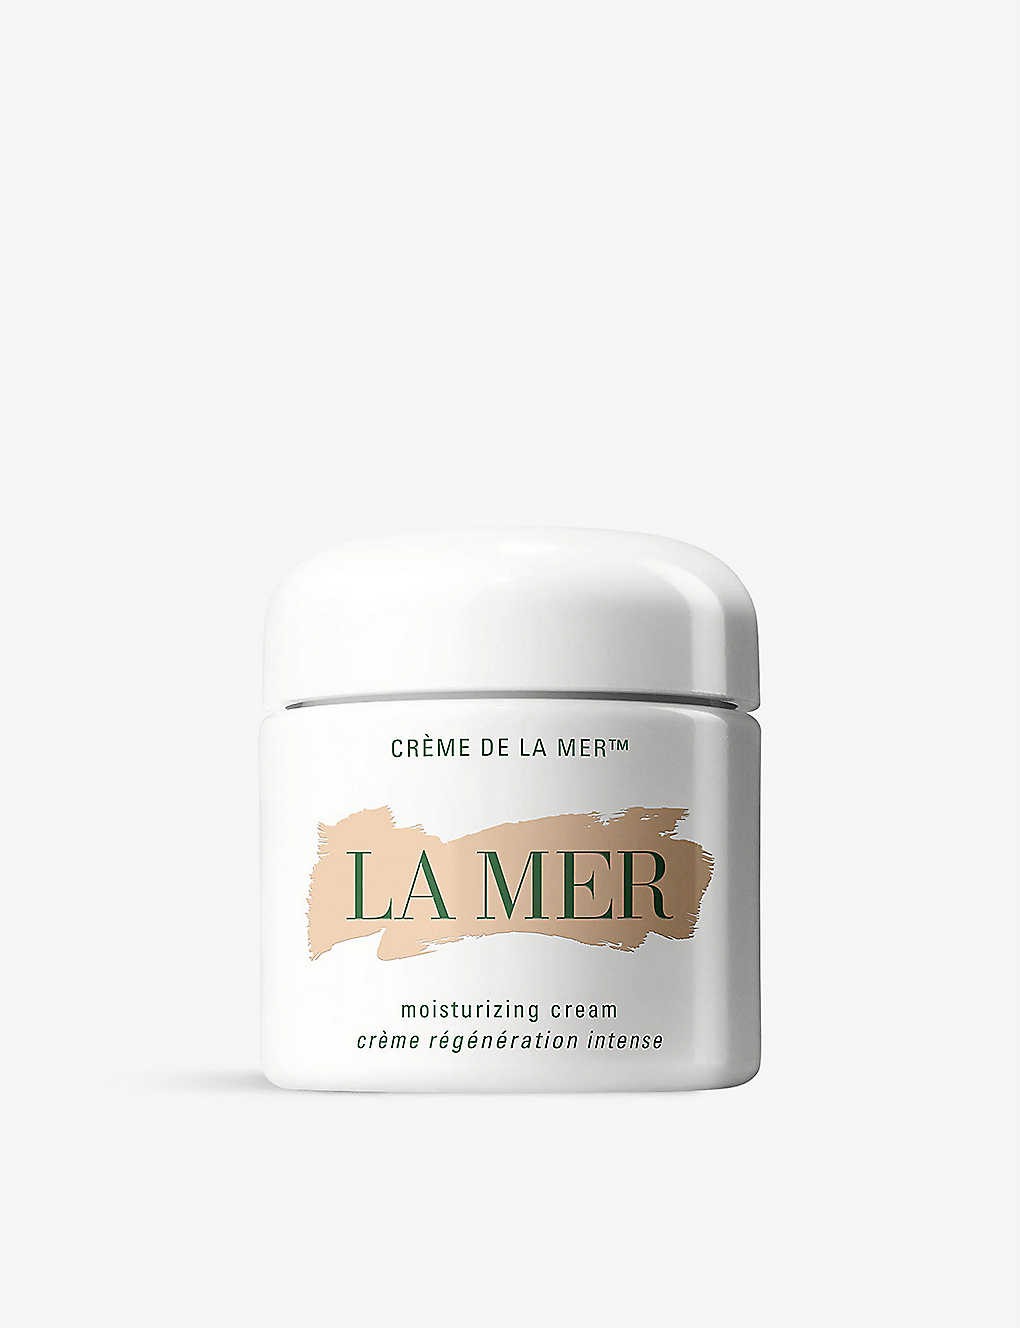 LA MER: Moisturising cream 100ml